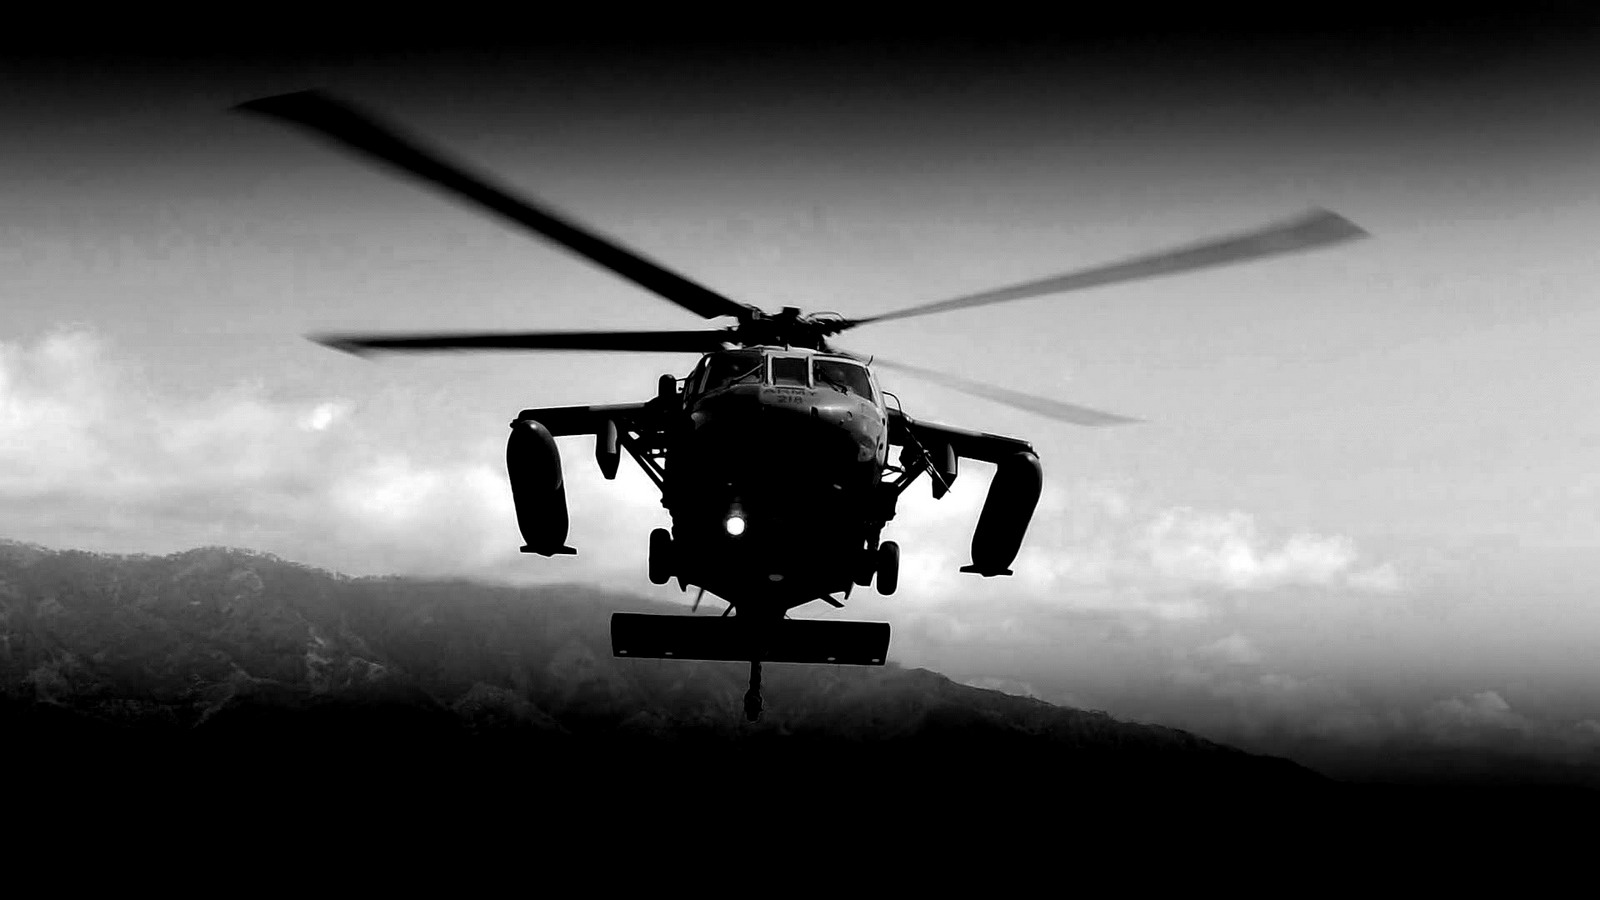 http://1.bp.blogspot.com/-30tukspO7AI/Td41_Fzg5fI/AAAAAAAAAtE/kyXC8p0-NXE/s1600/Flying+Hilly+Copter.jpg